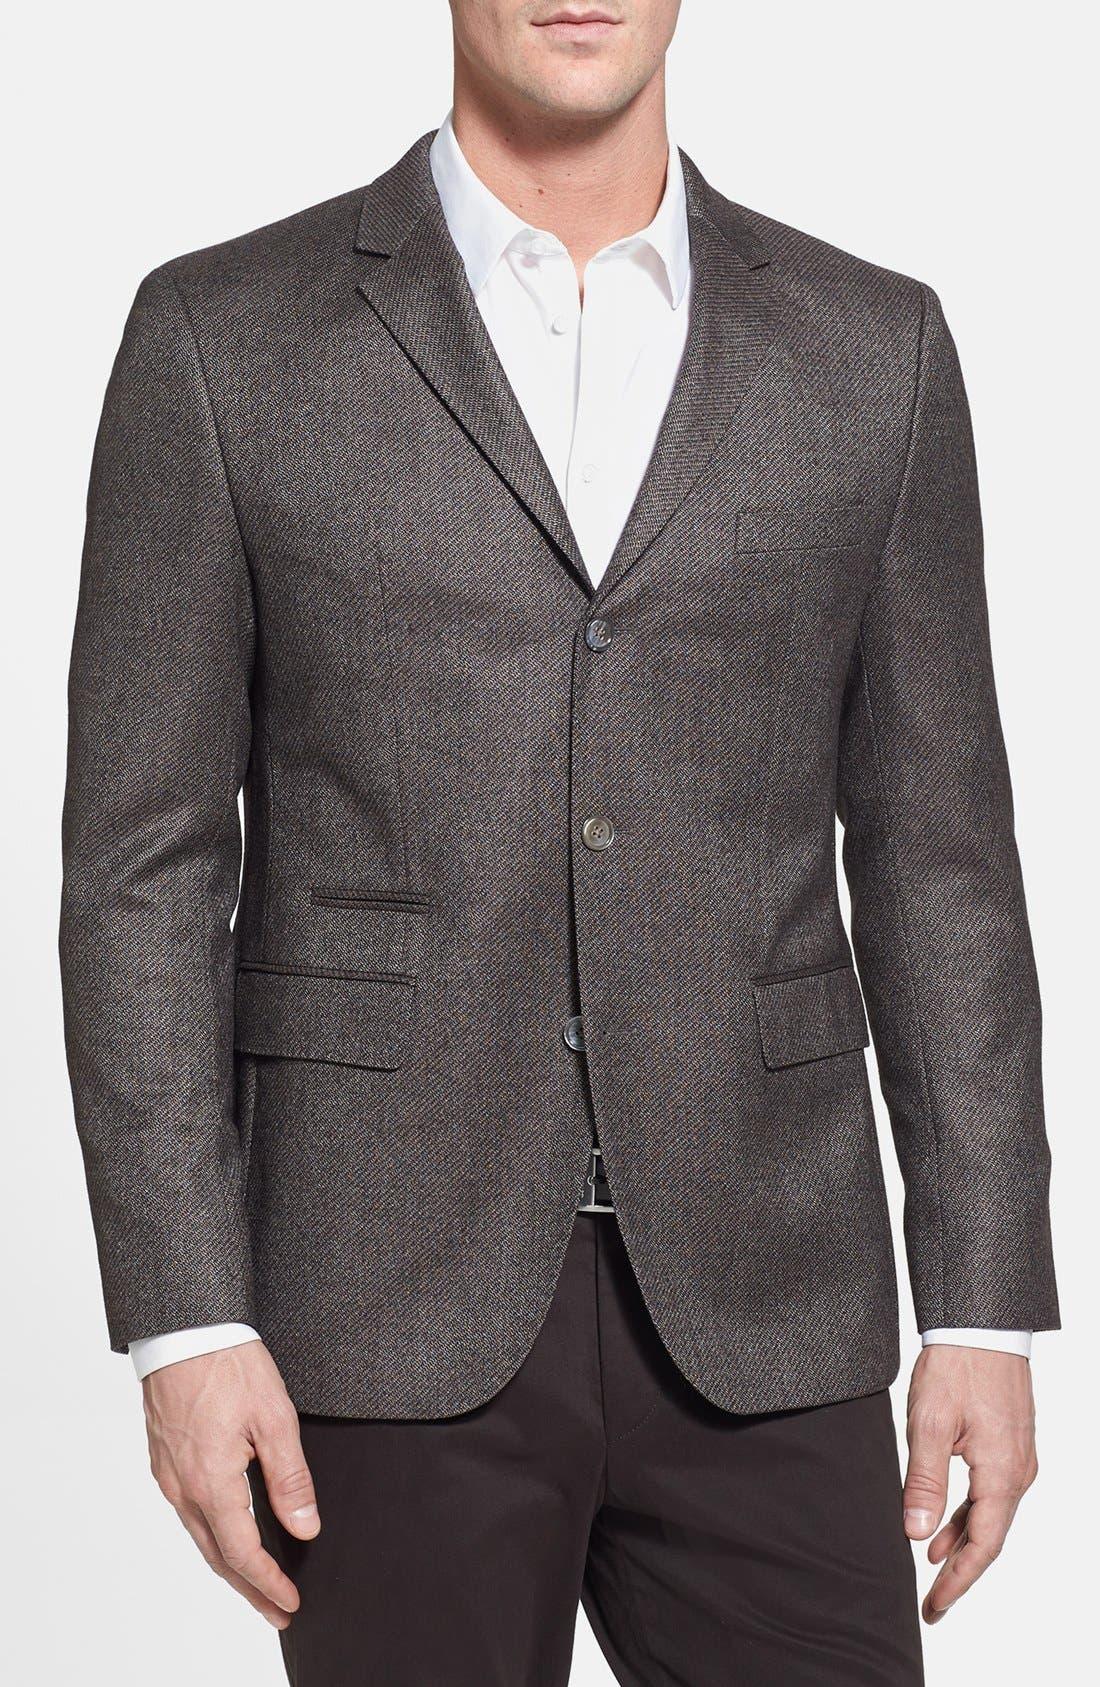 Main Image - BOSS HUGO BOSS 'Johnston' Classic Fit Three-Button Sportcoat